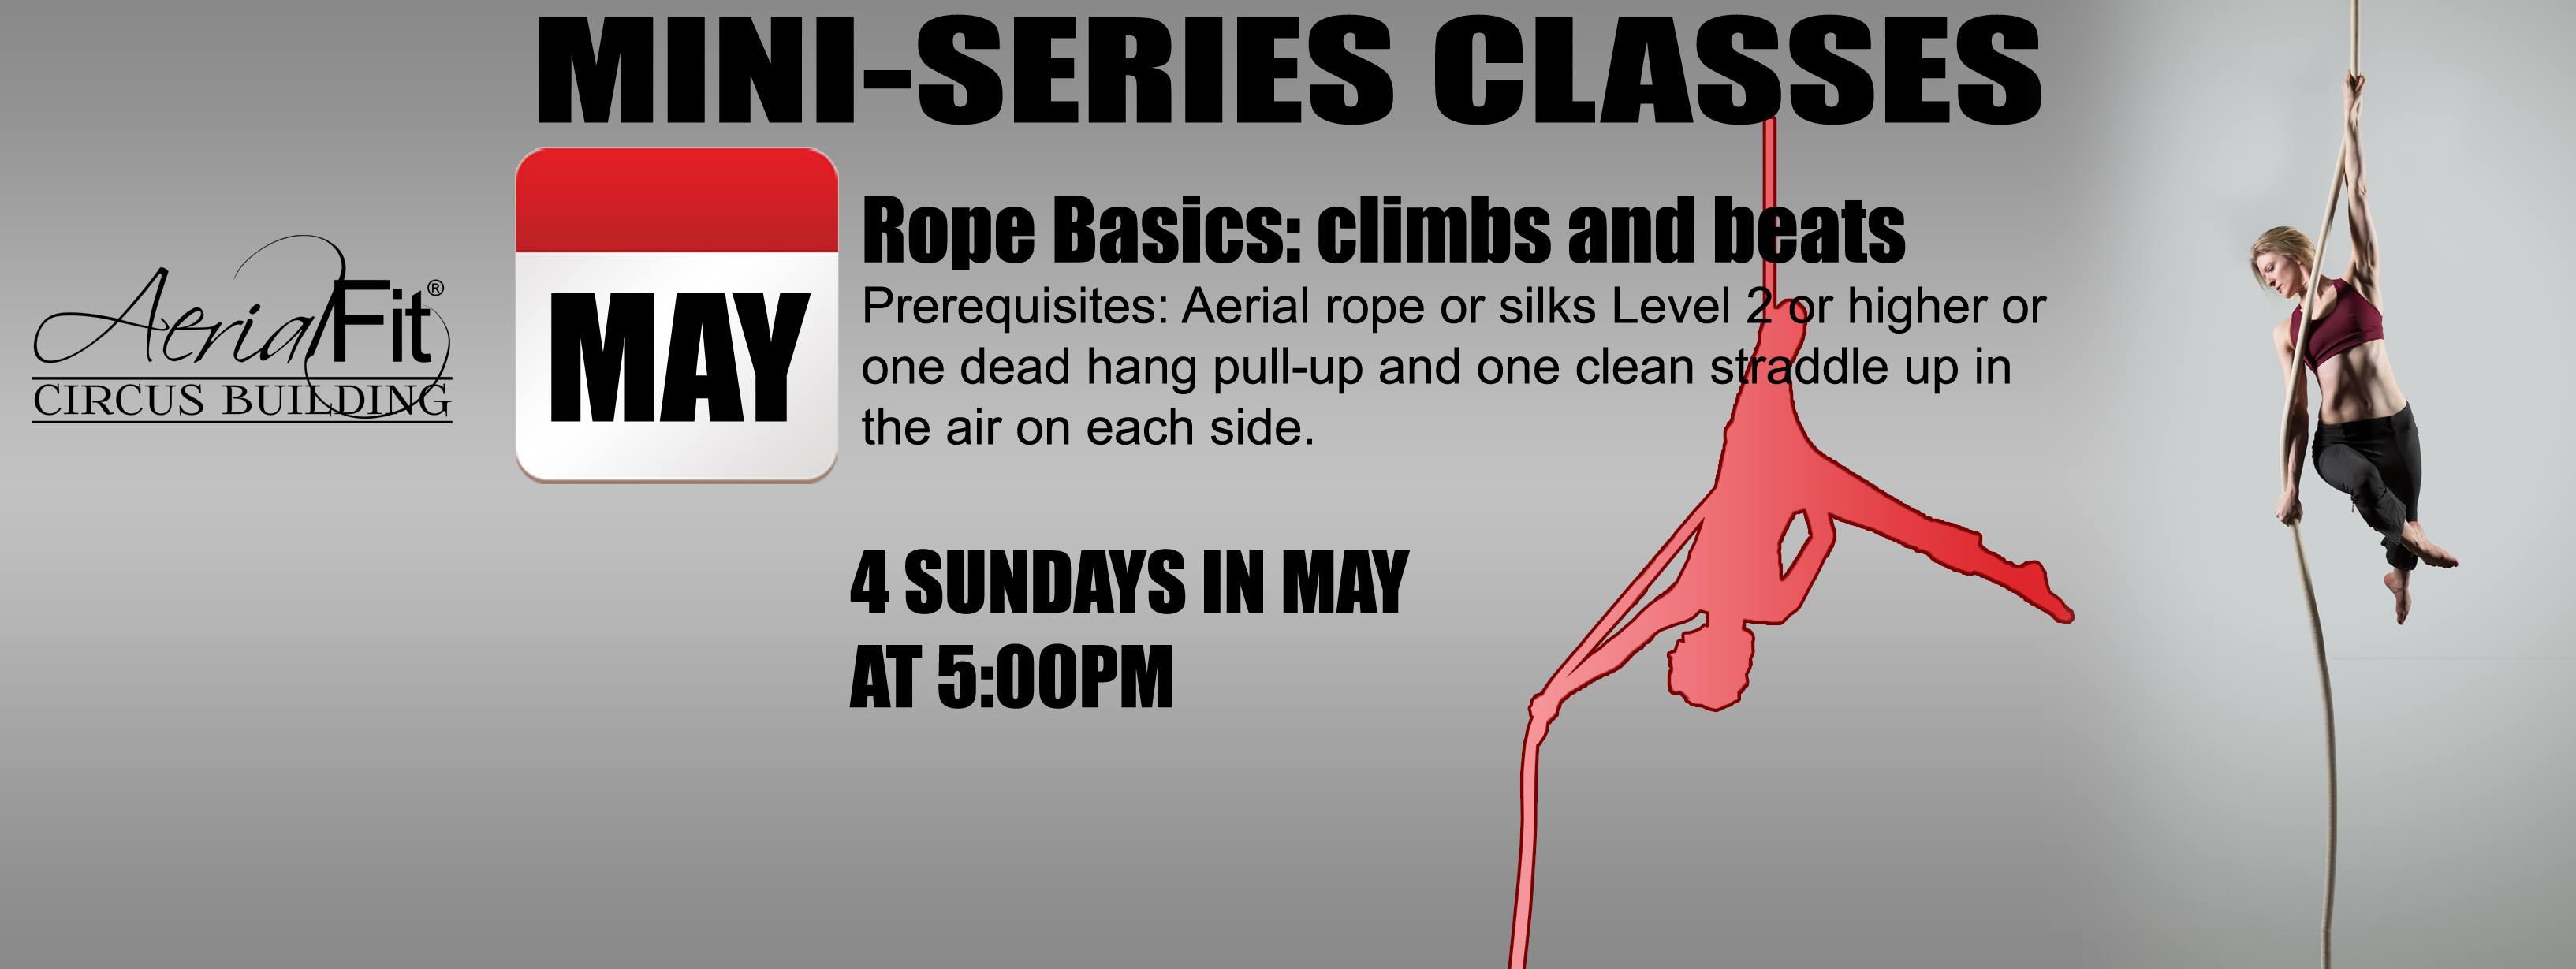 Rope Basics - Climbs and Beats